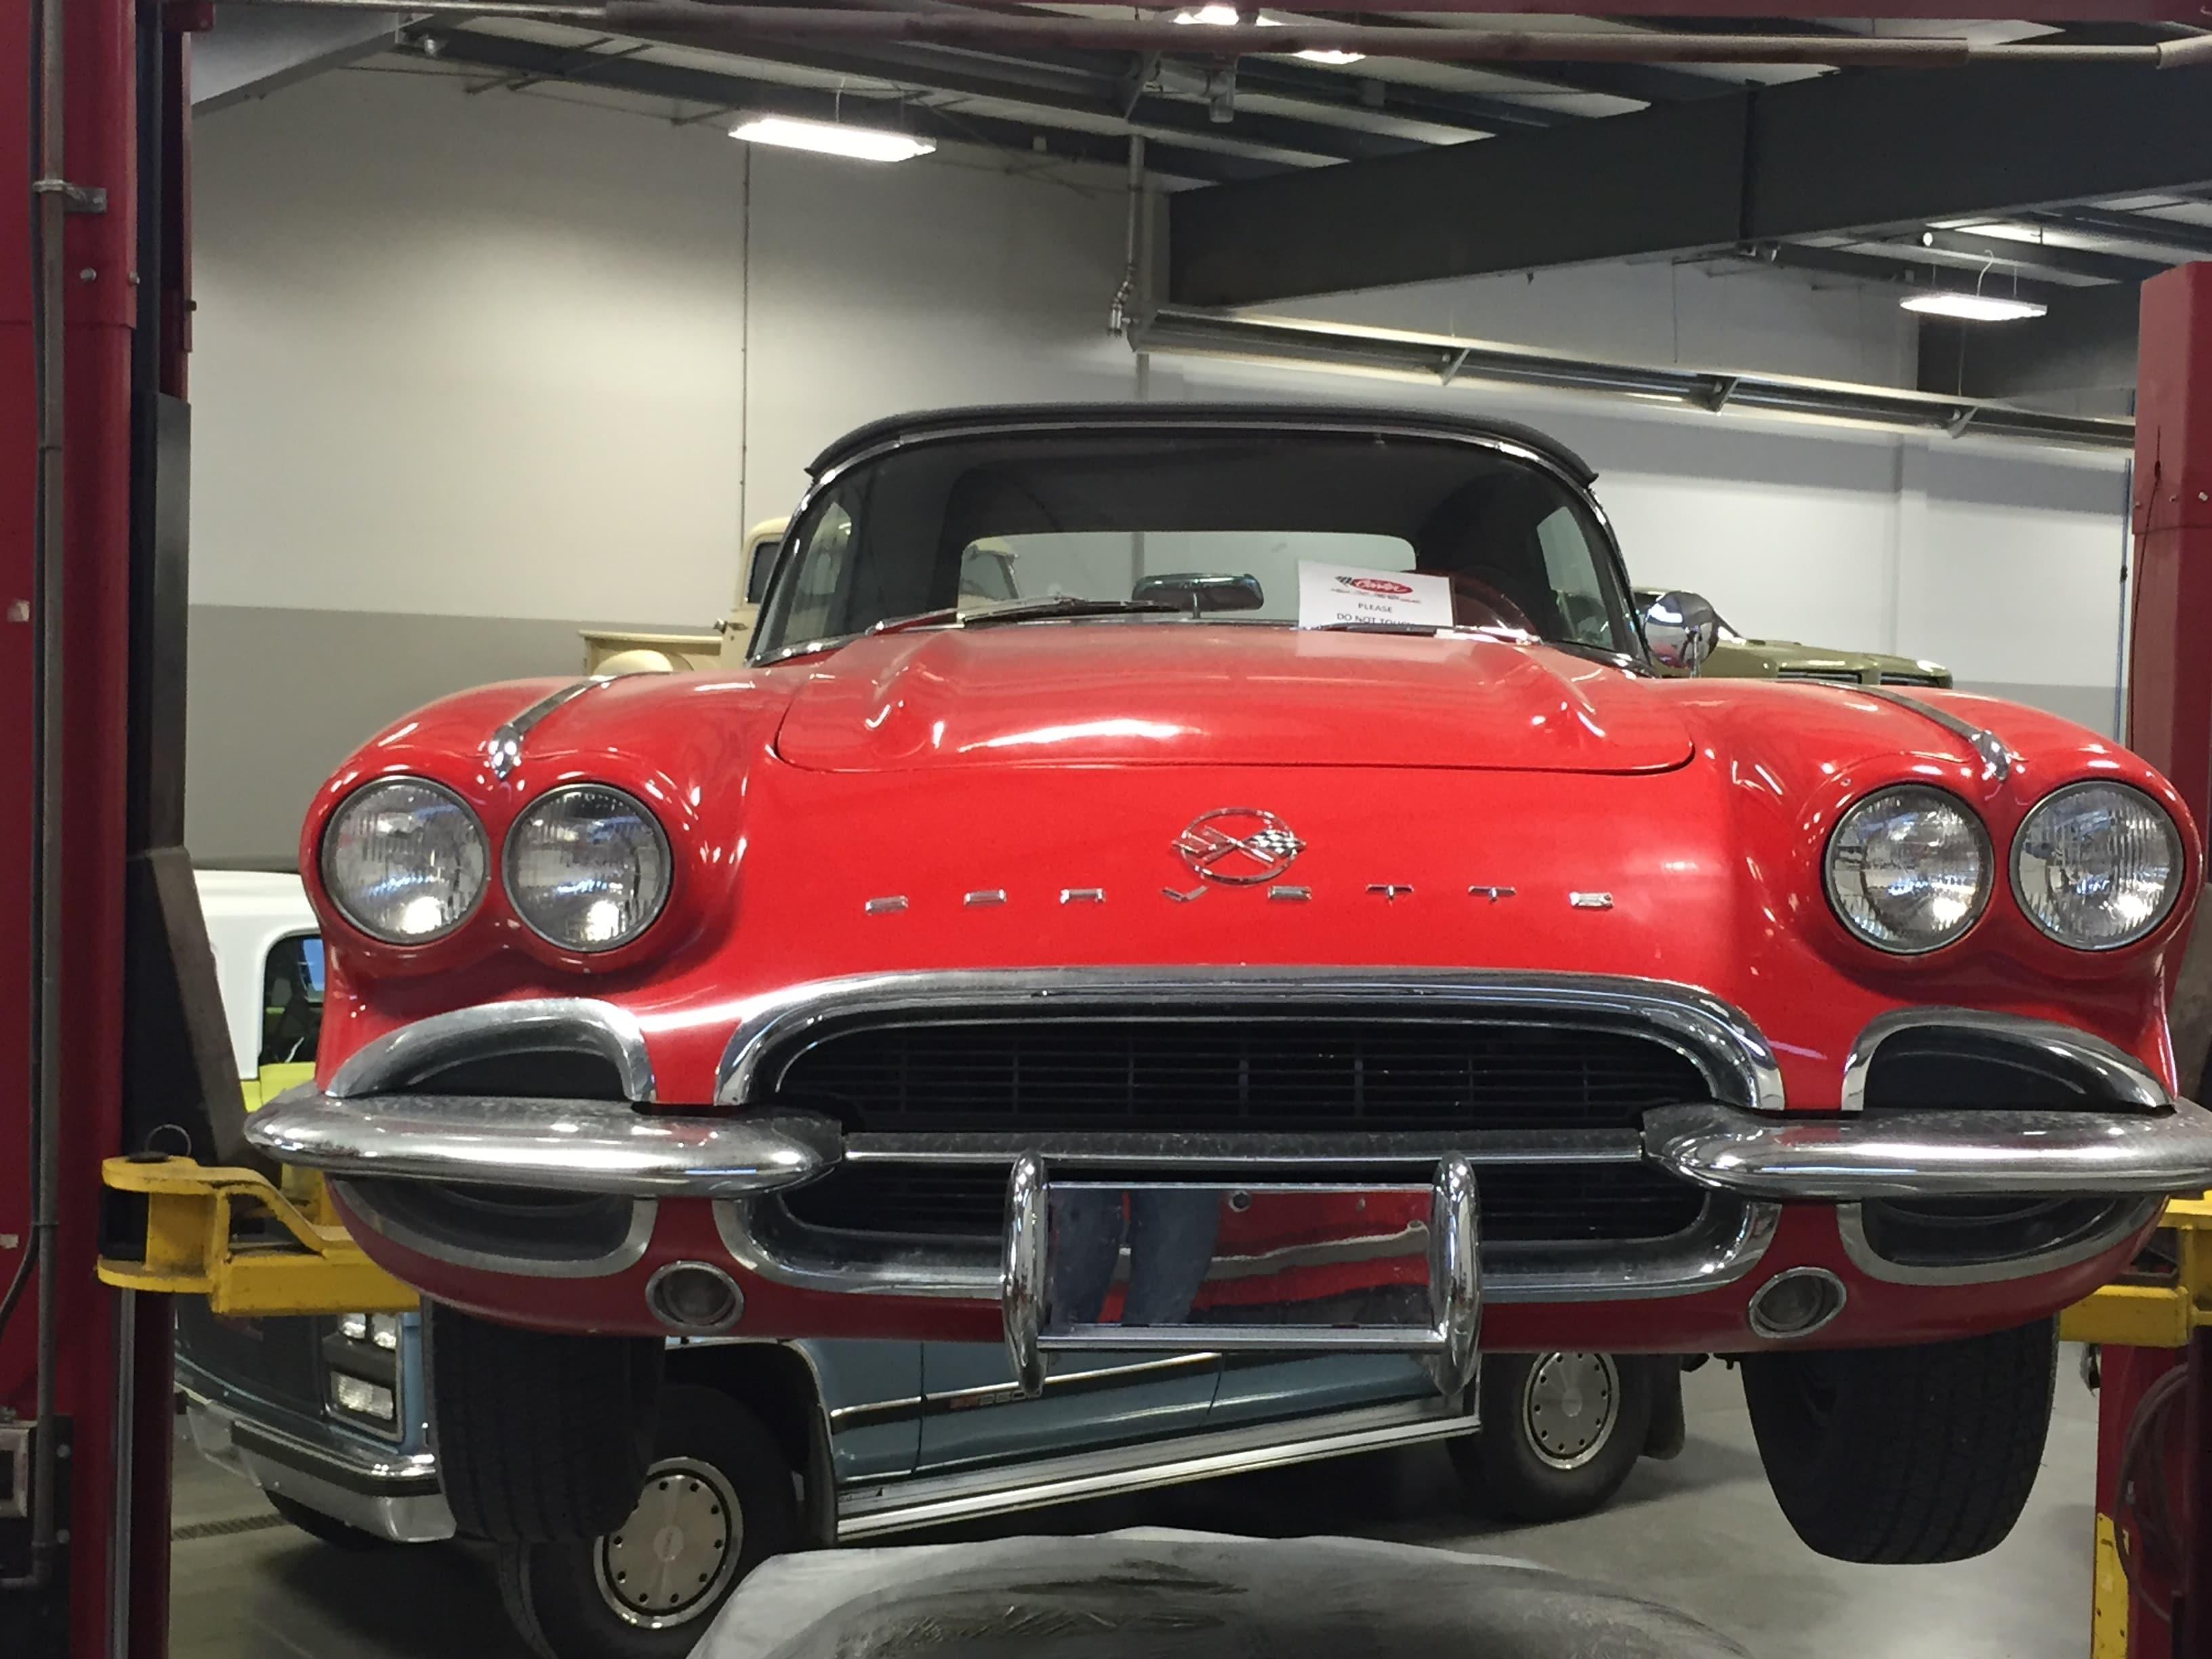 Jack Carter Chevrolet Cadillac Buick GMC | New Buick ...